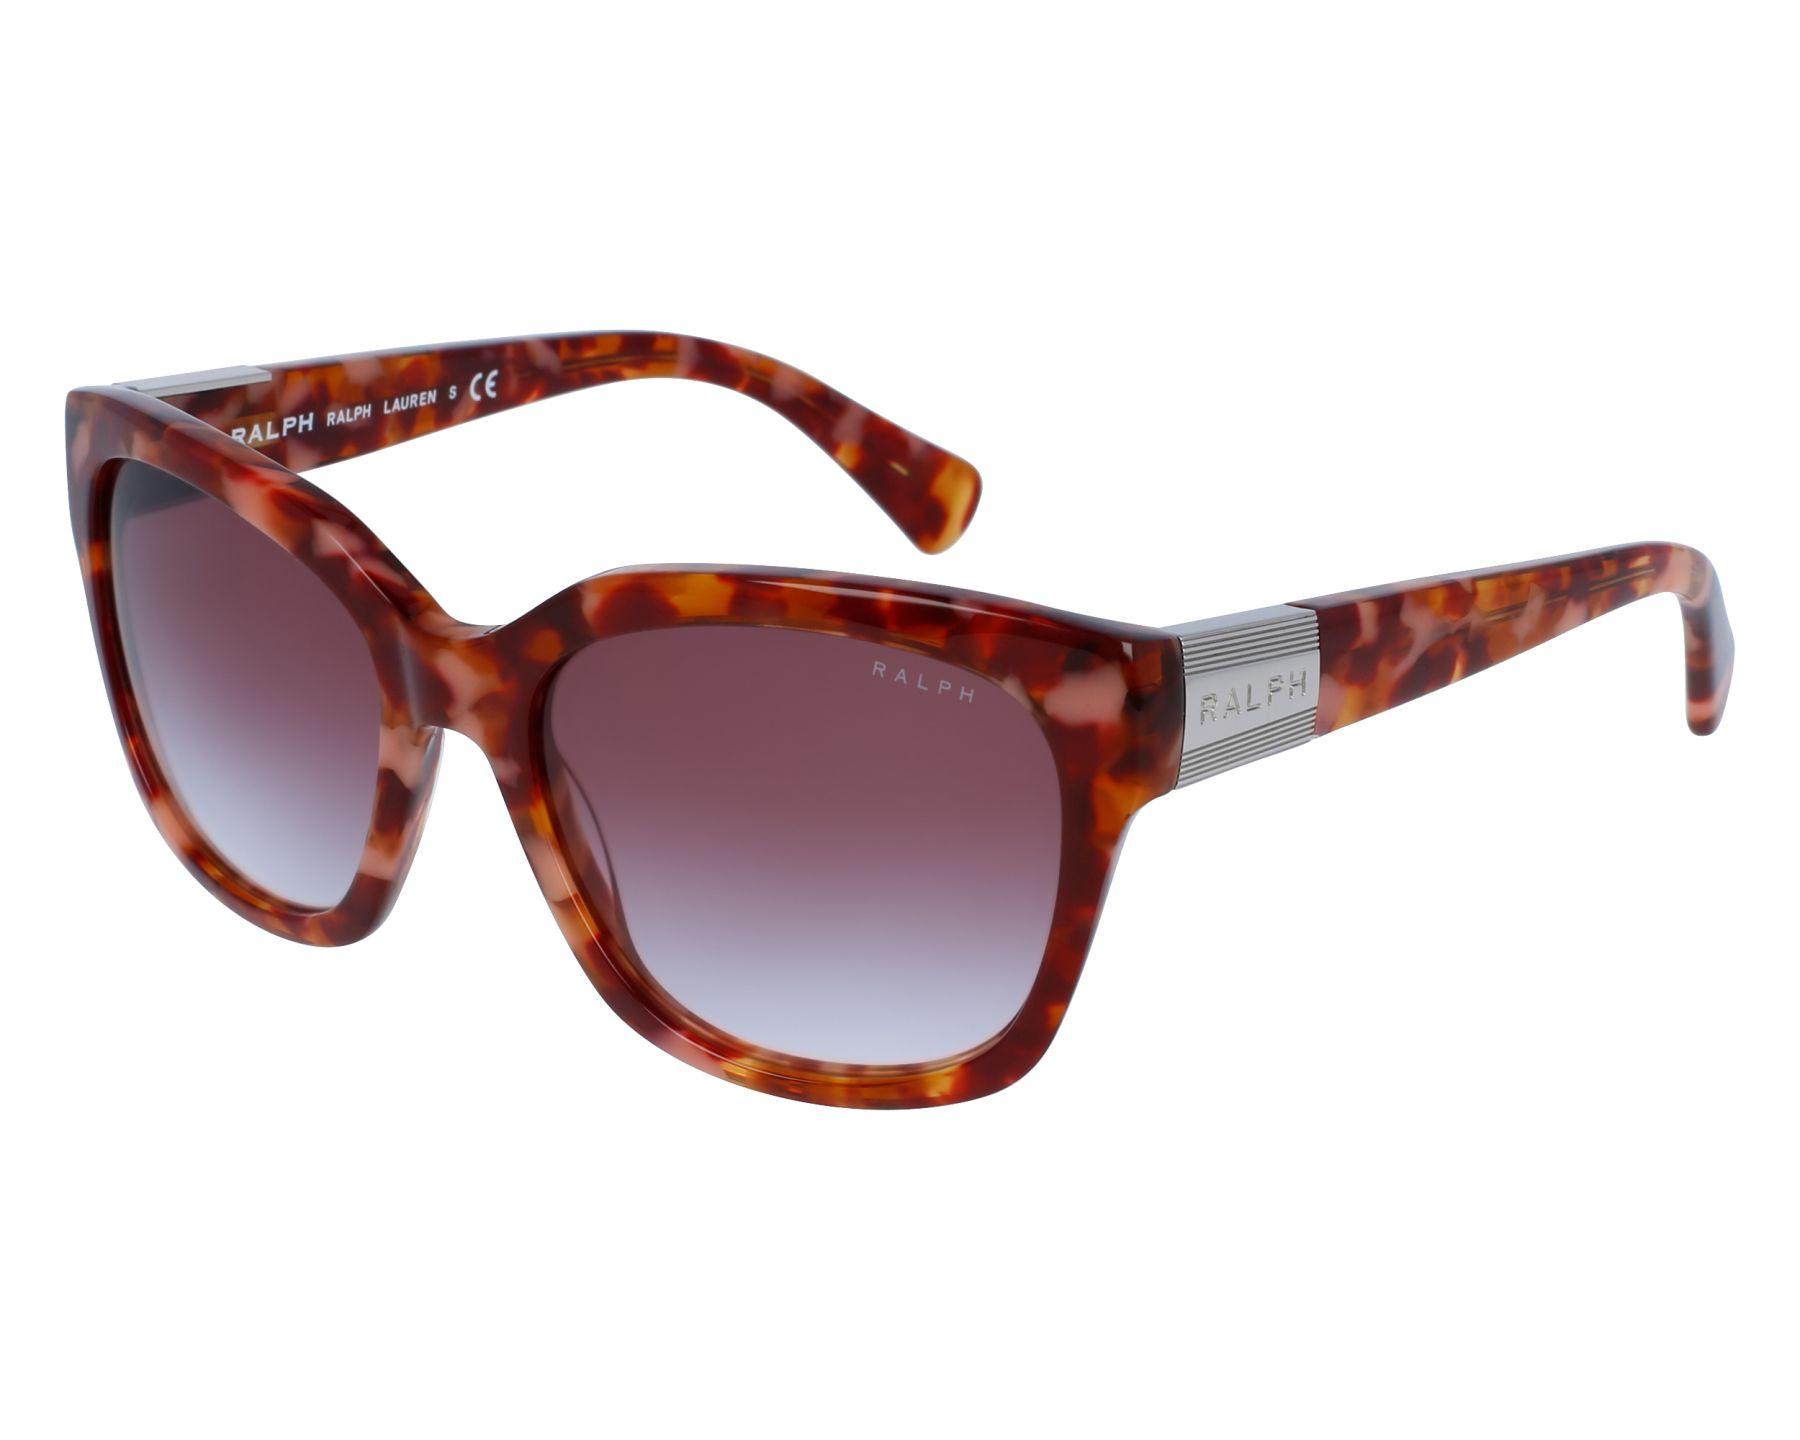 30878cba2d Gafas de sol Ralph Lauren RA-5221 15878H 54-17 Bordeaux vista de frente